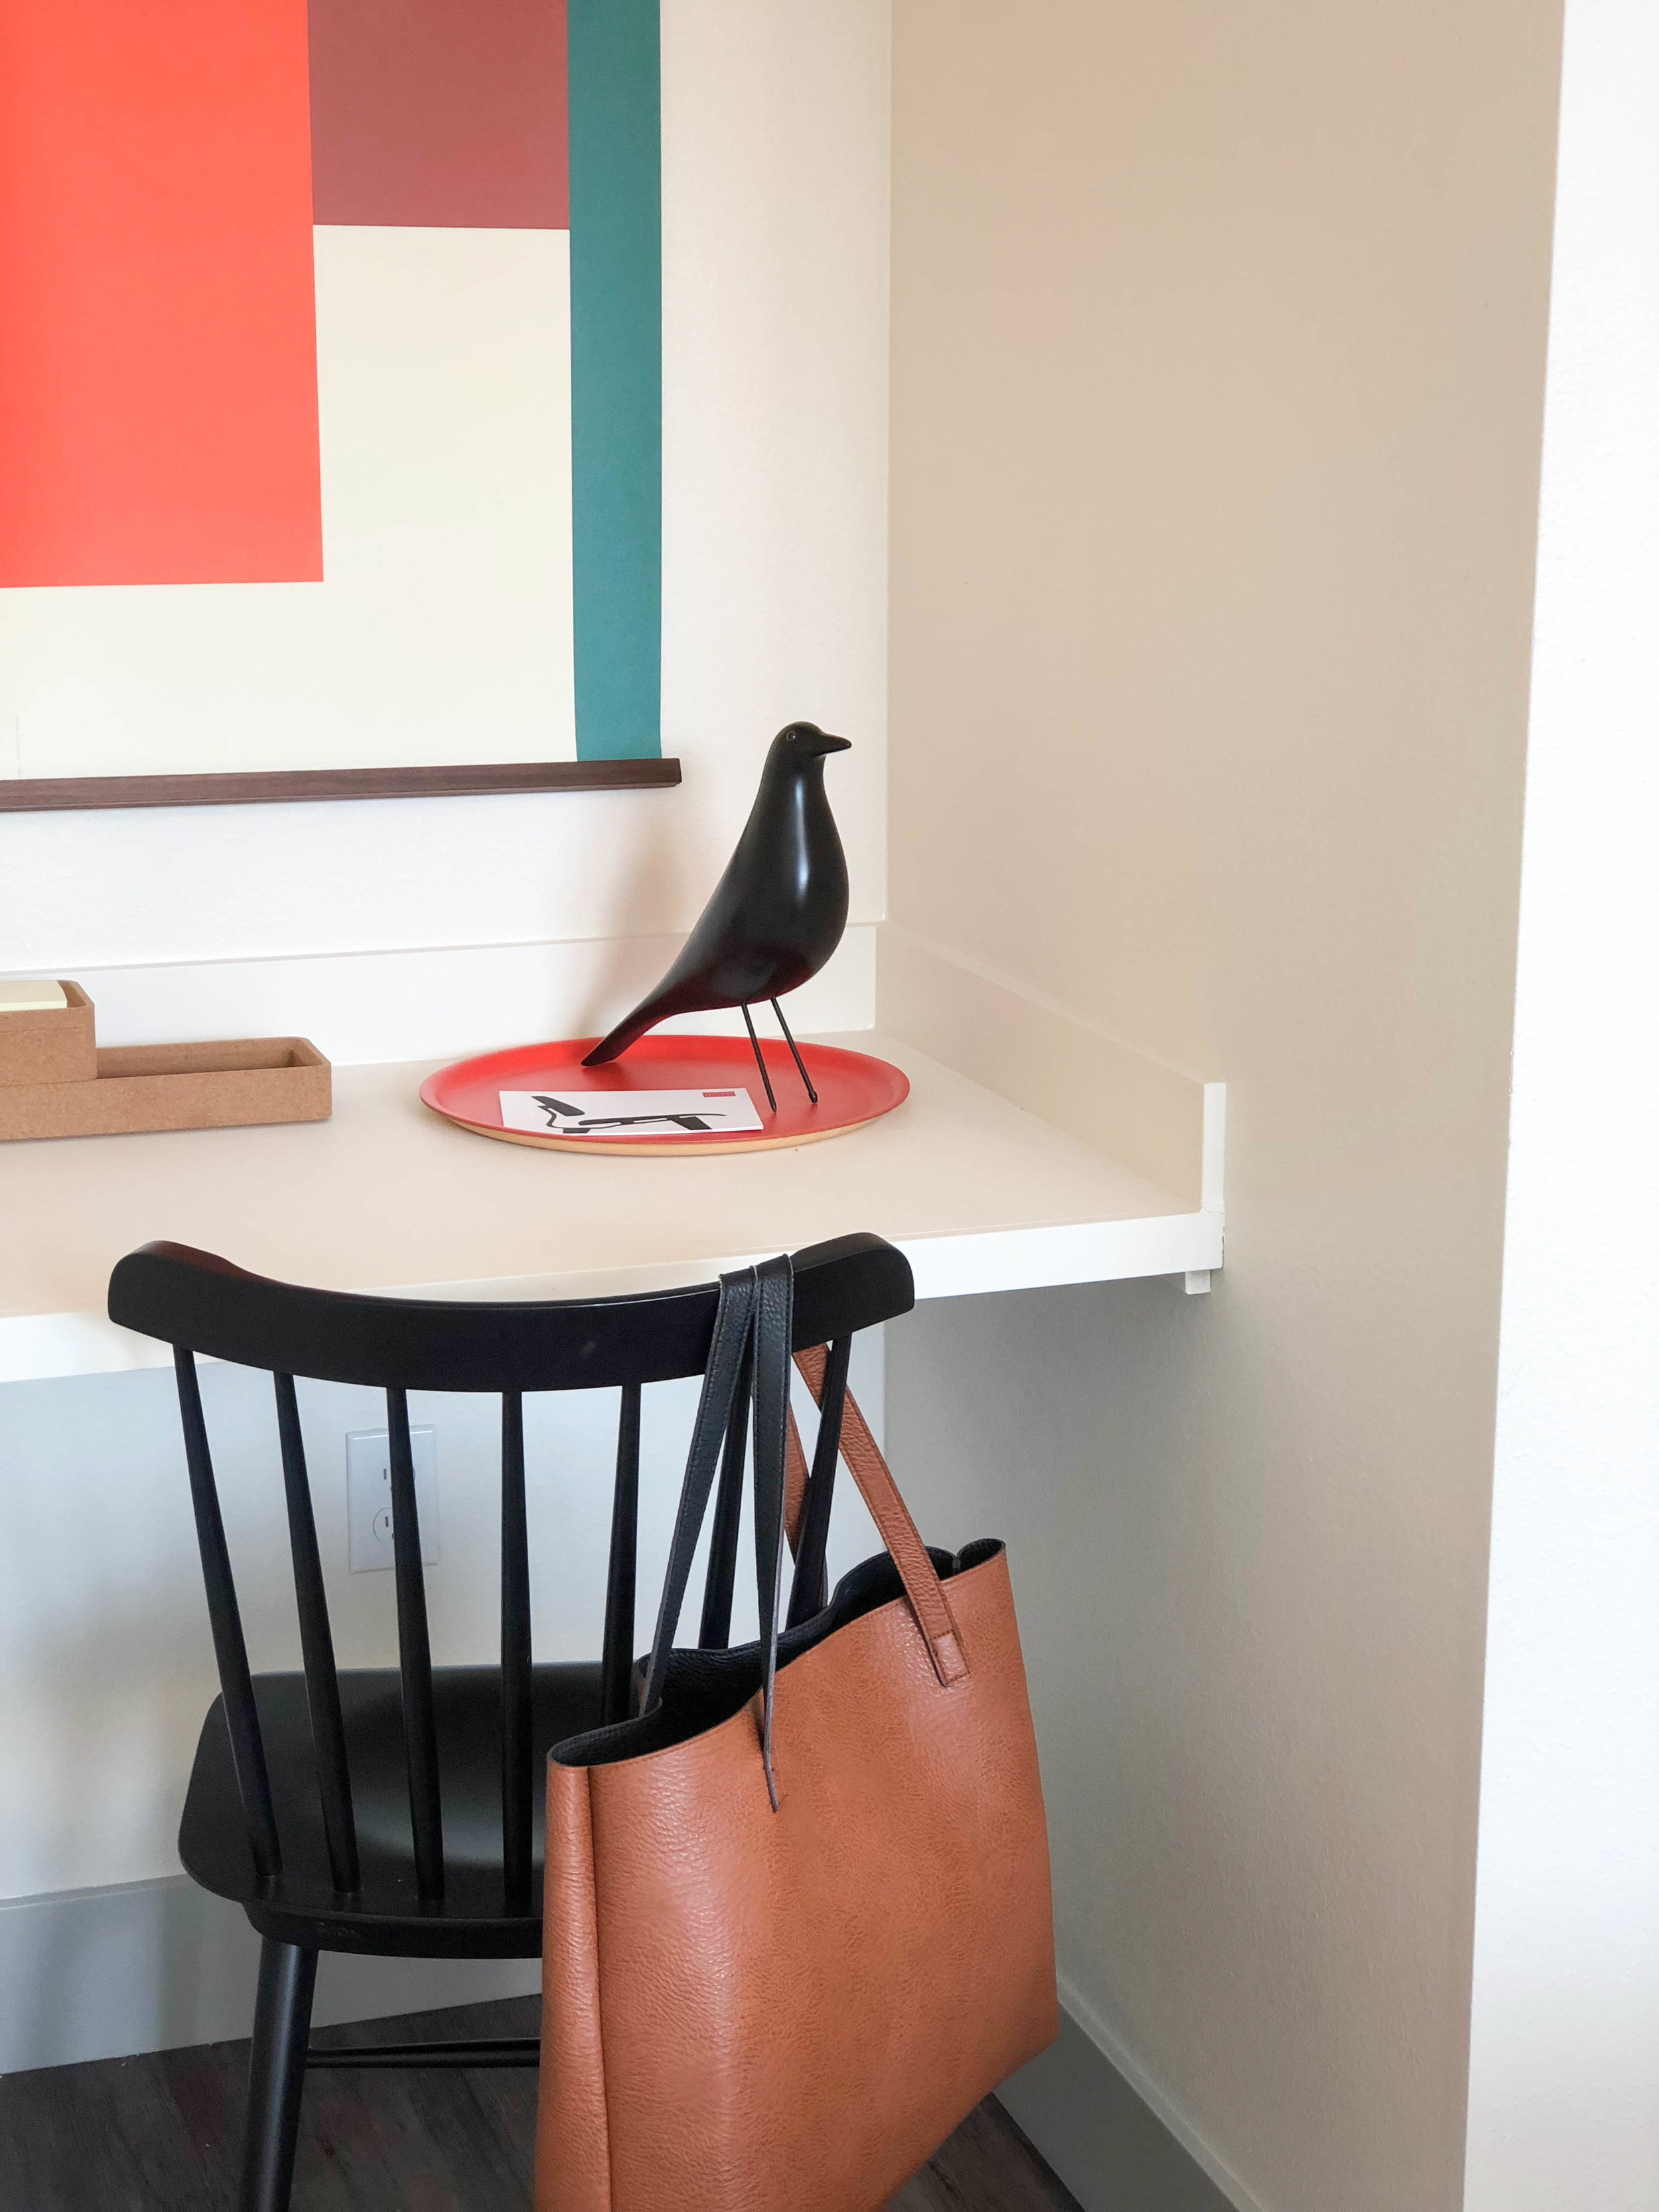 Everett - One Bedroom Office